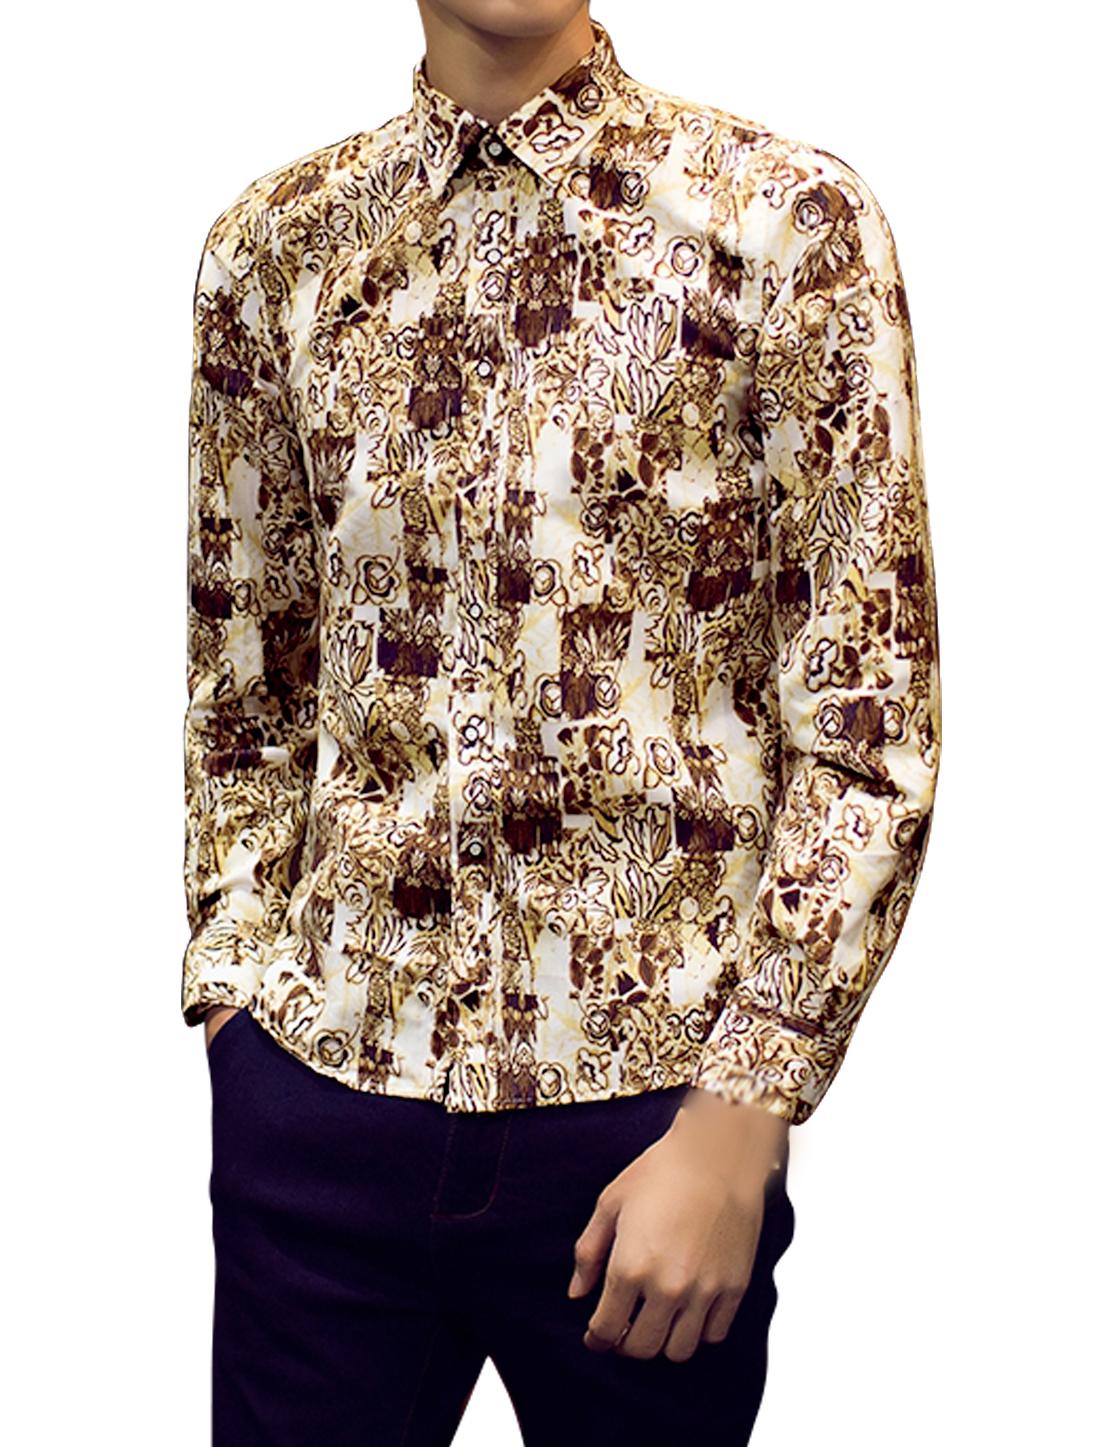 Men Flower Novelty Prints Slim Fit Button Closed Shirt Beige S